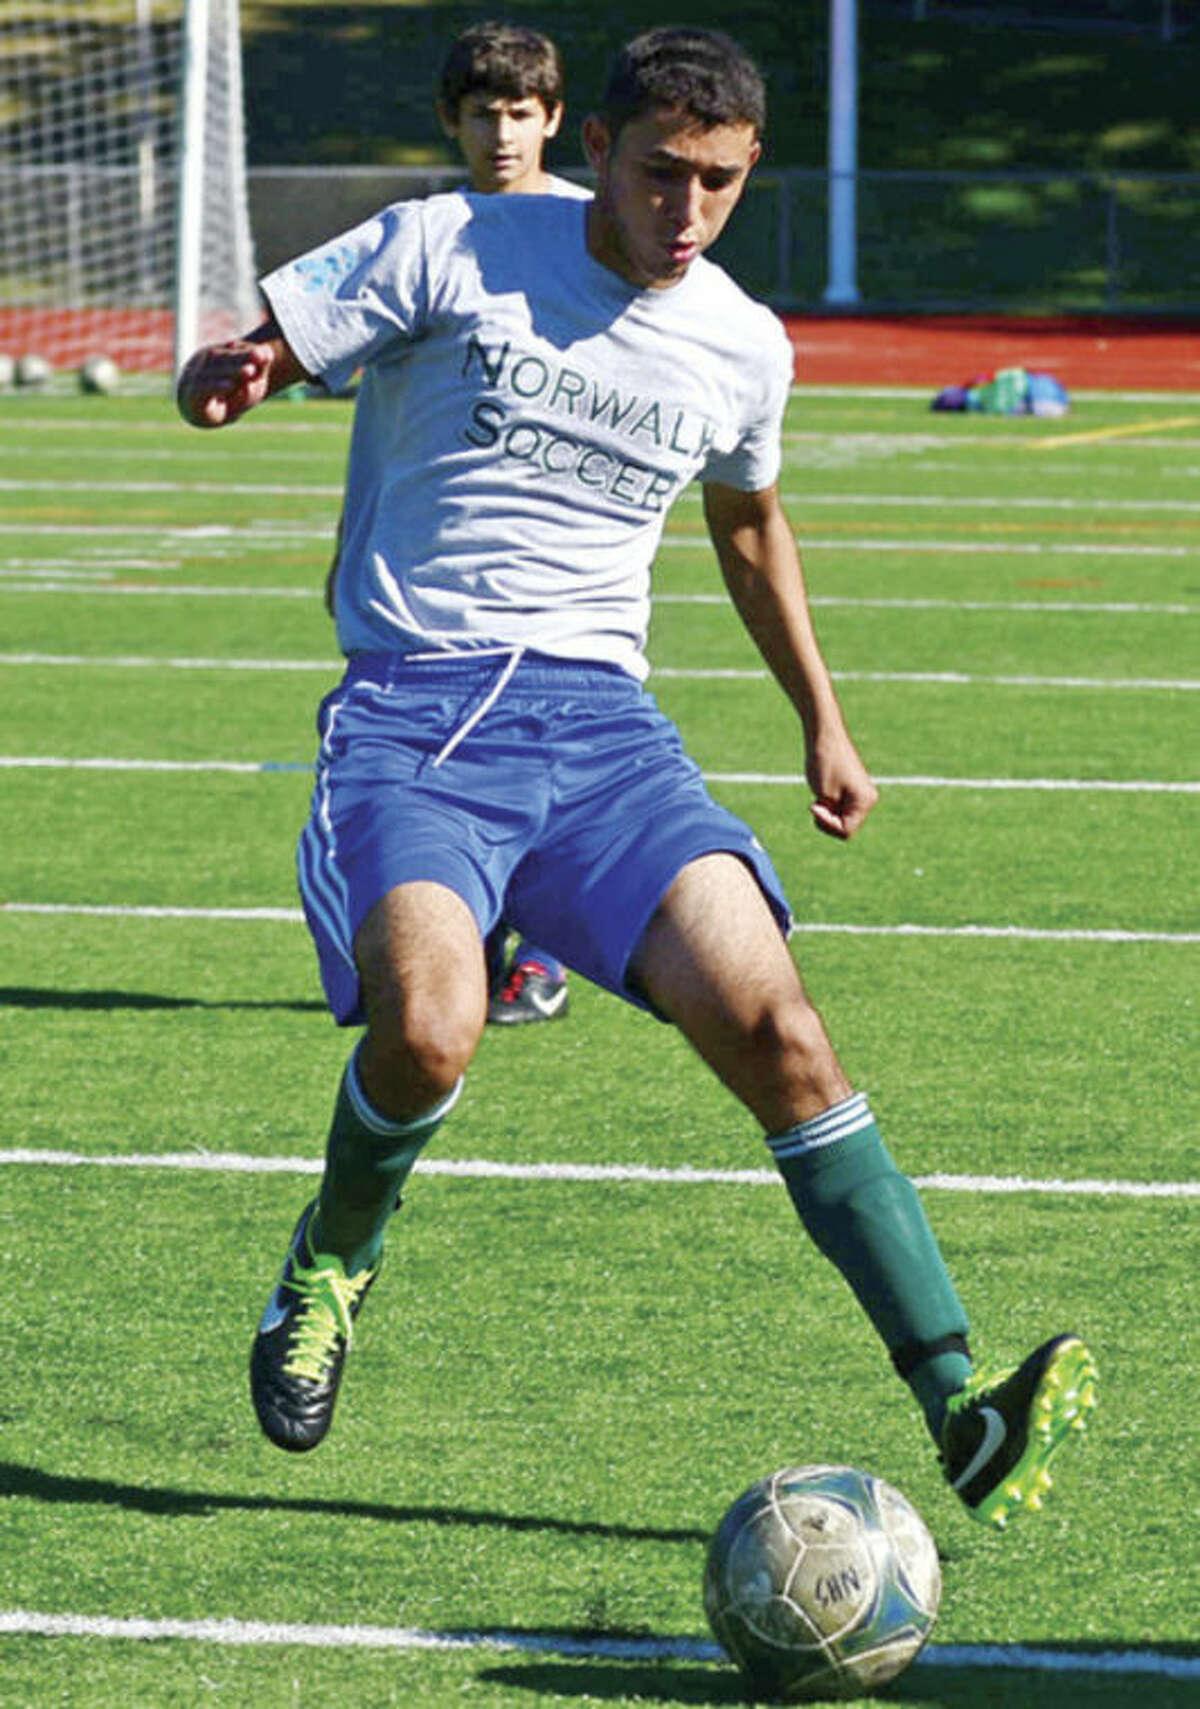 Hour photo/John Nash Norwalk High School boys soccer player Rene Jimenez dribbles the ball on the Testa Field turf at a preseason practice.